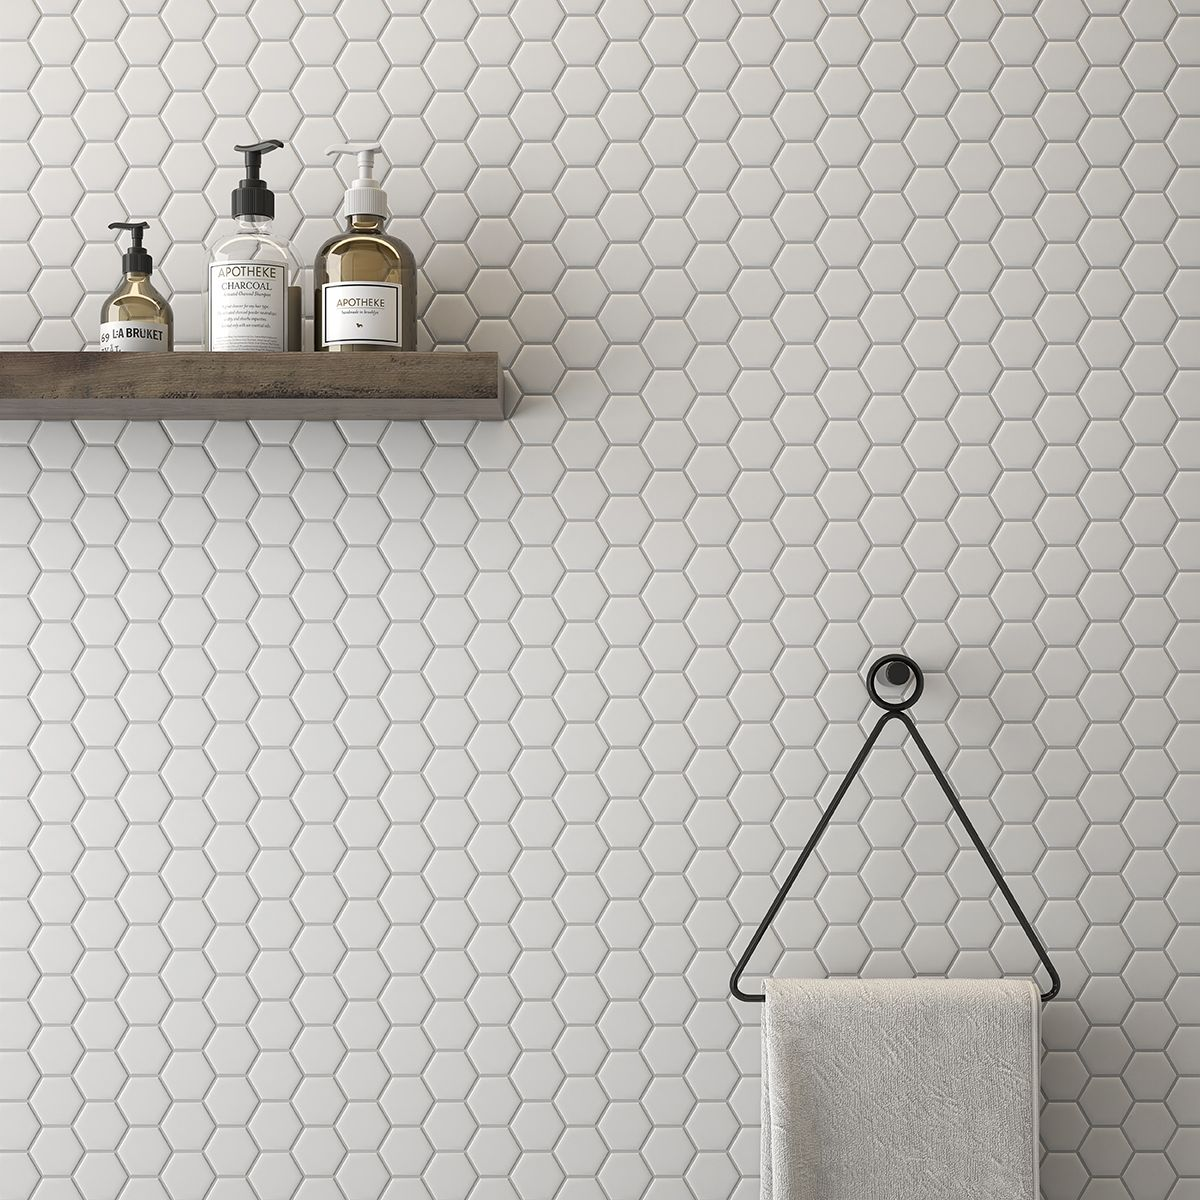 White matte cc mosaics collection ceramic tiles by roca cc white matte cc mosaics collection ceramic tiles by roca doublecrazyfo Gallery